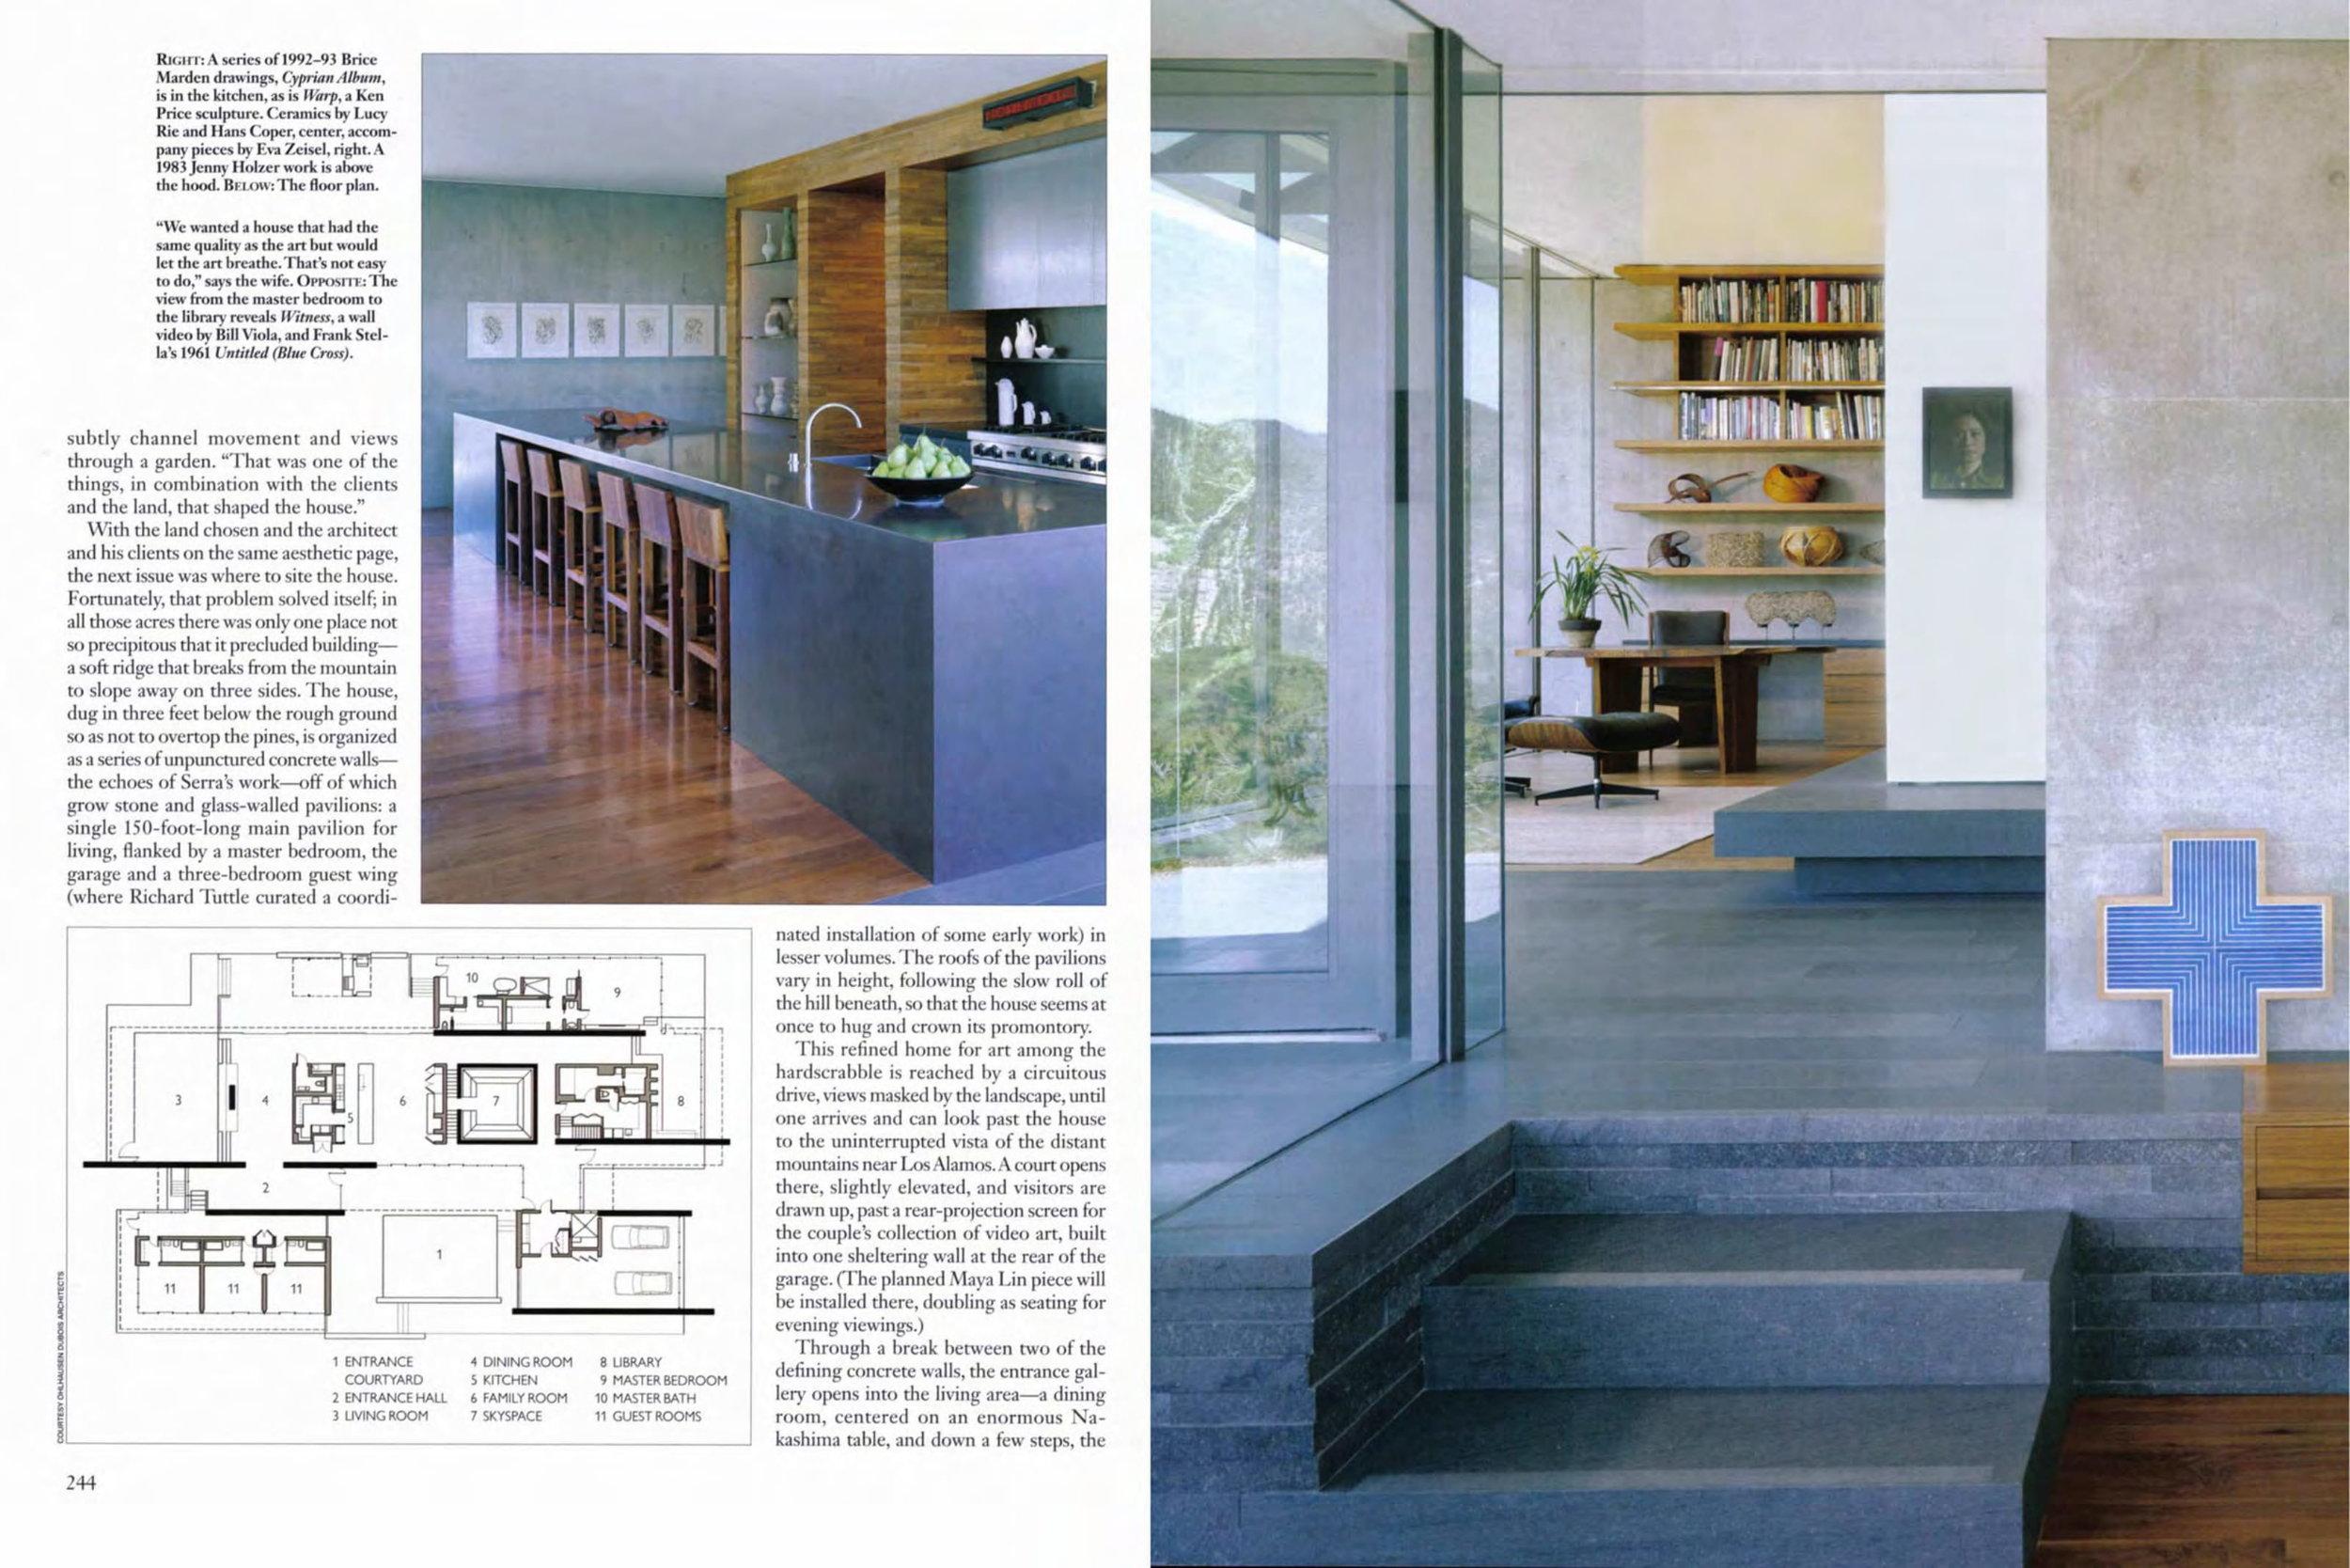 DuBois+Santa+Fe+Architectural+Digest-3.jpg